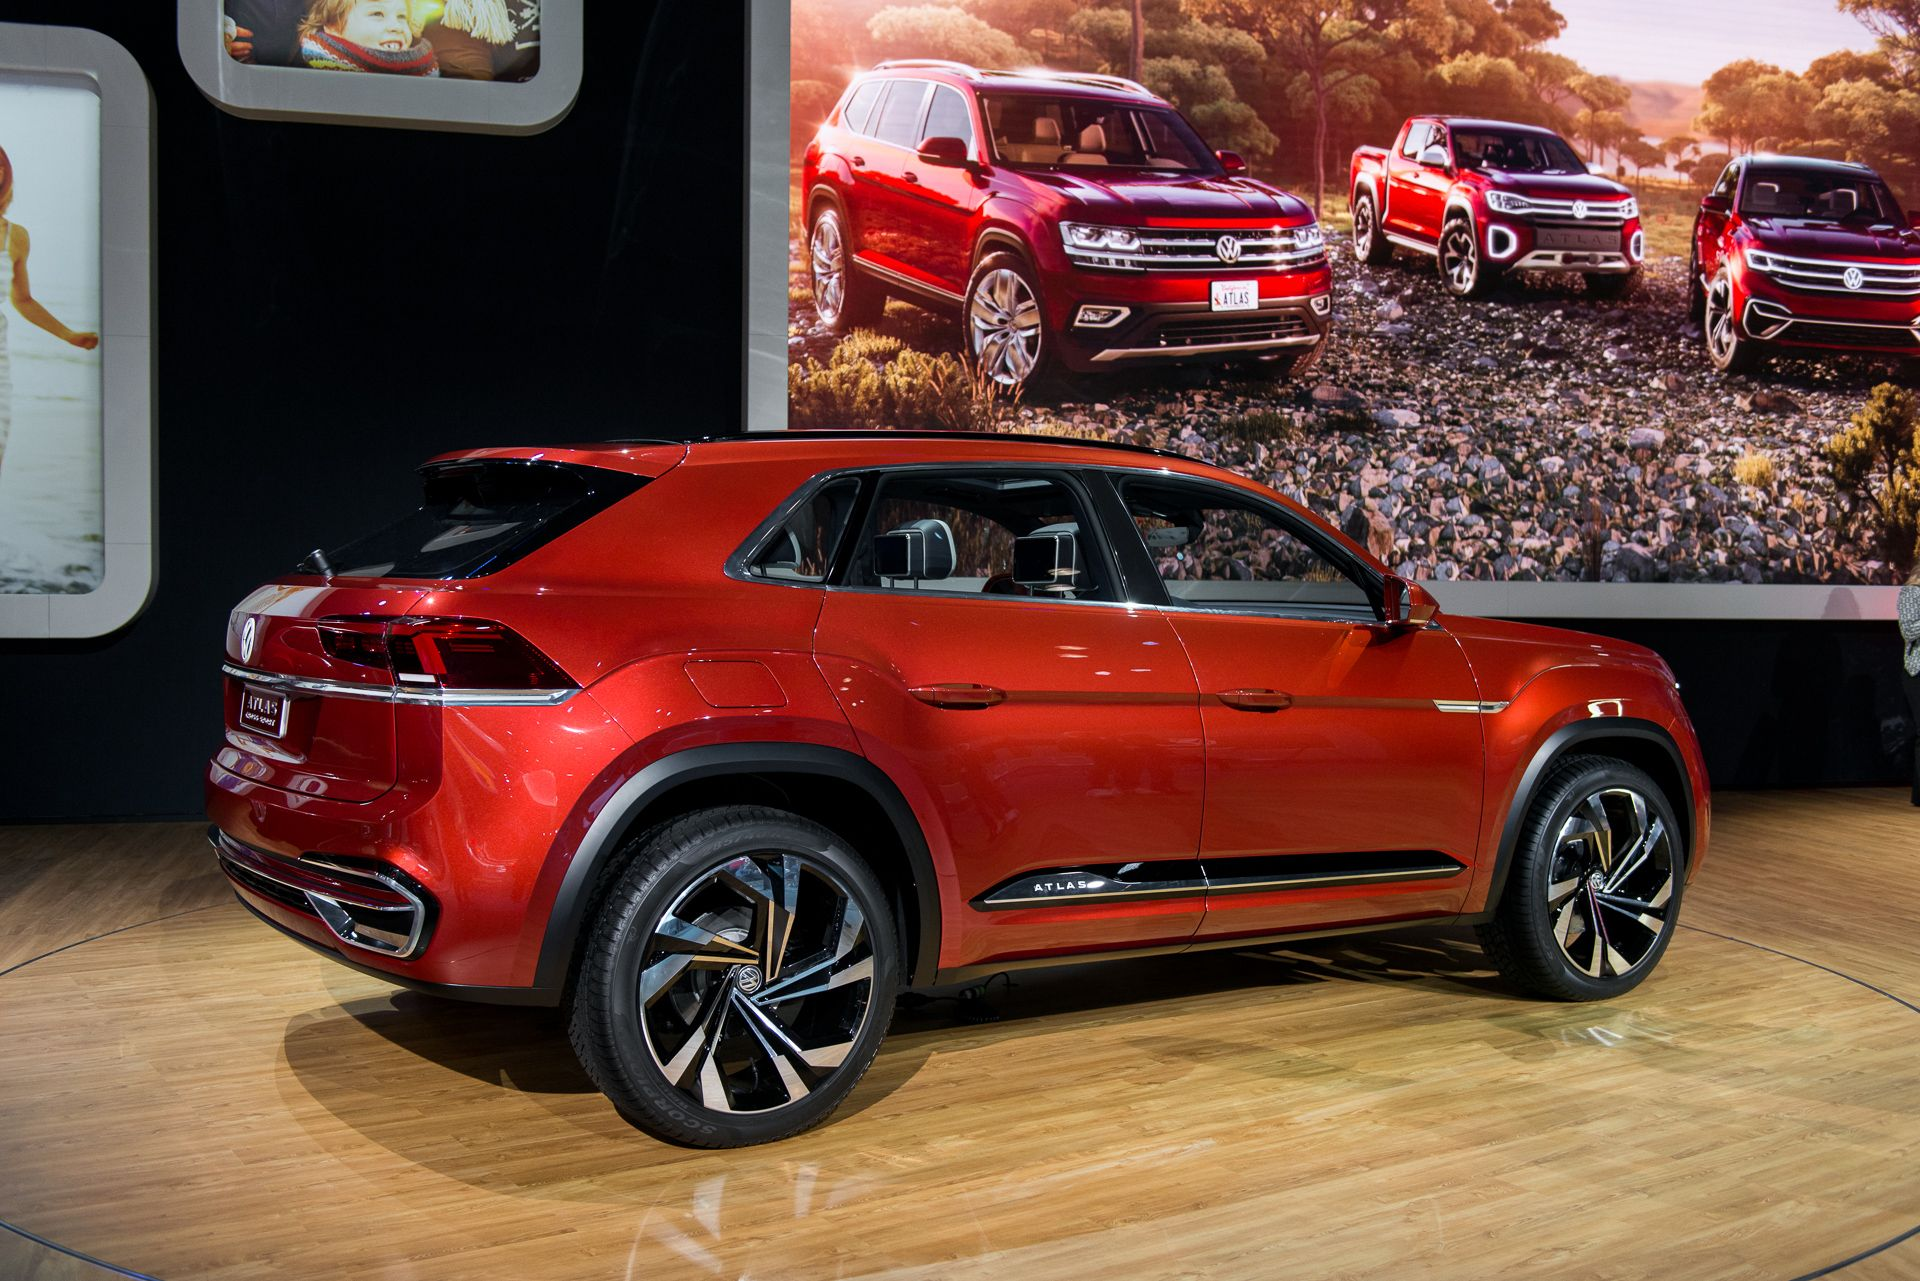 VW Atlas Cross Sport concept ditches 3rd row for sharper